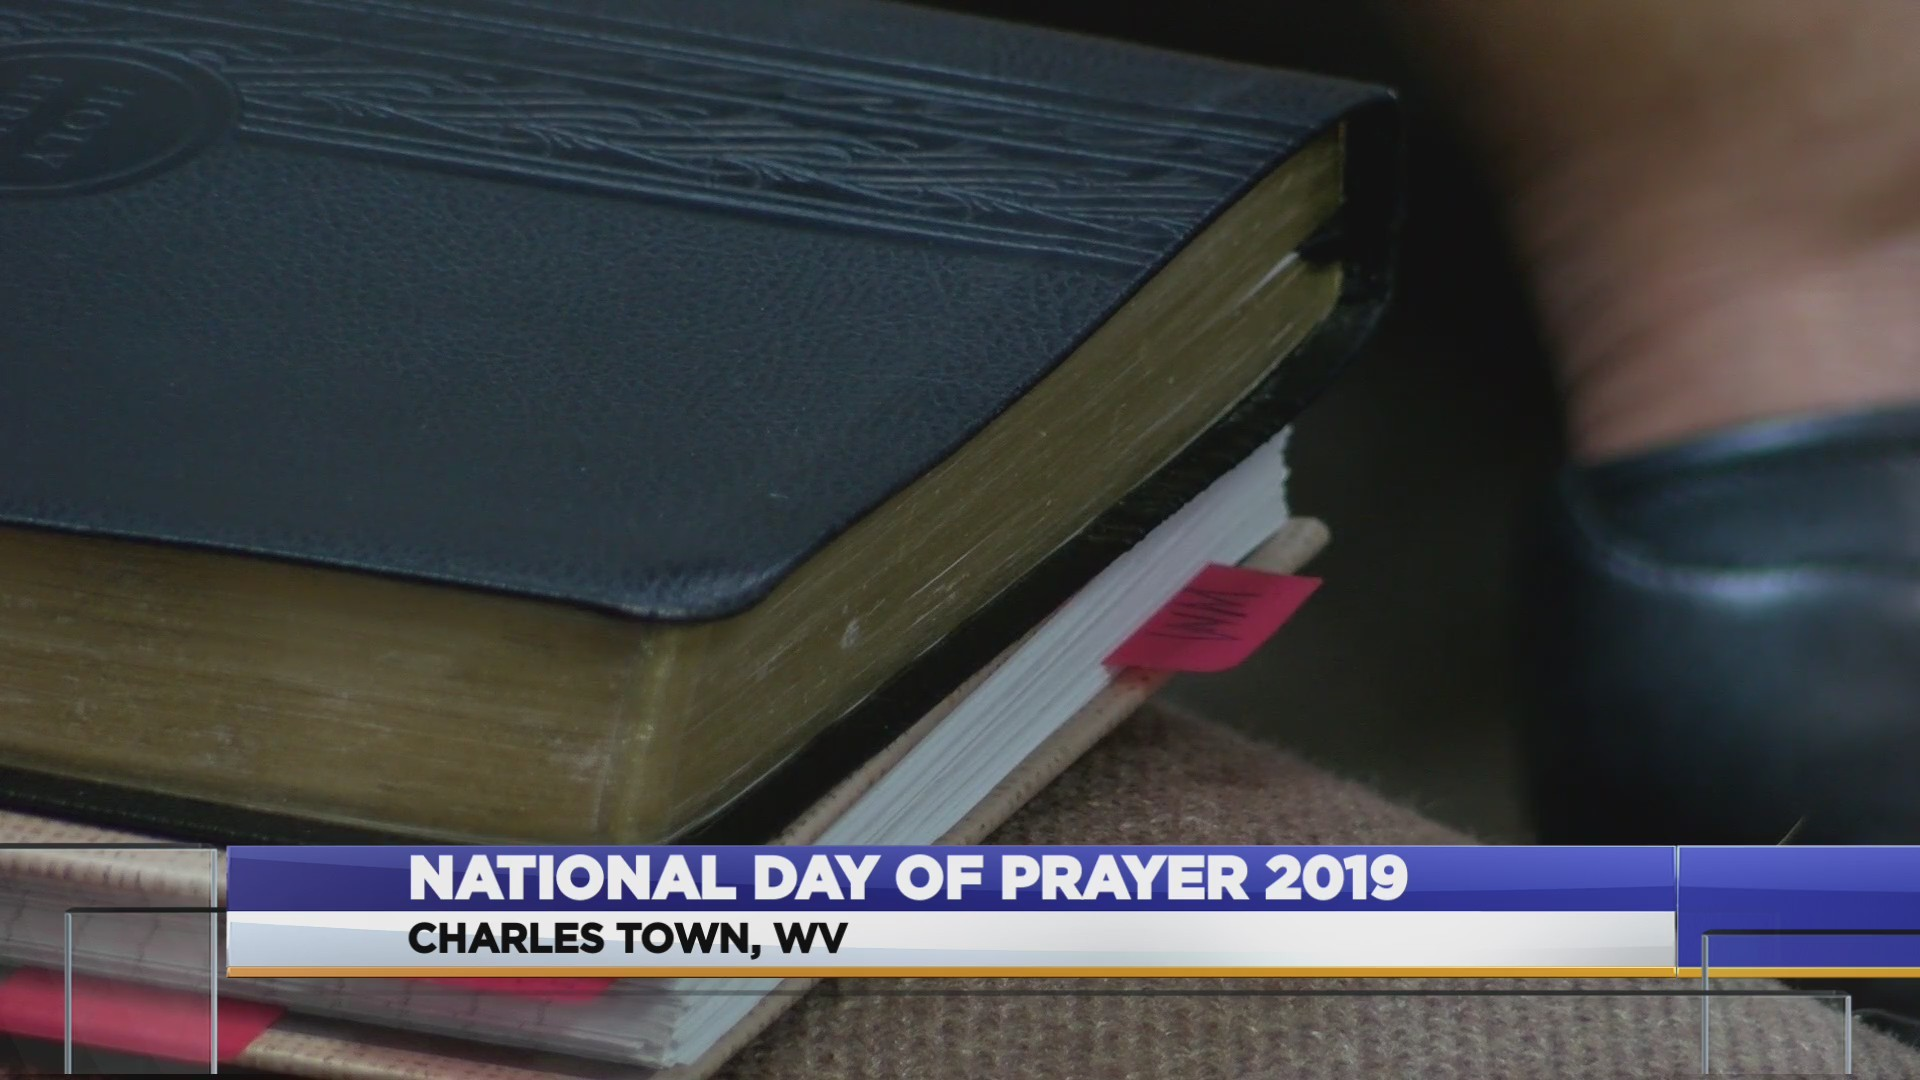 National_Day_of_Prayer_9_20190503021355